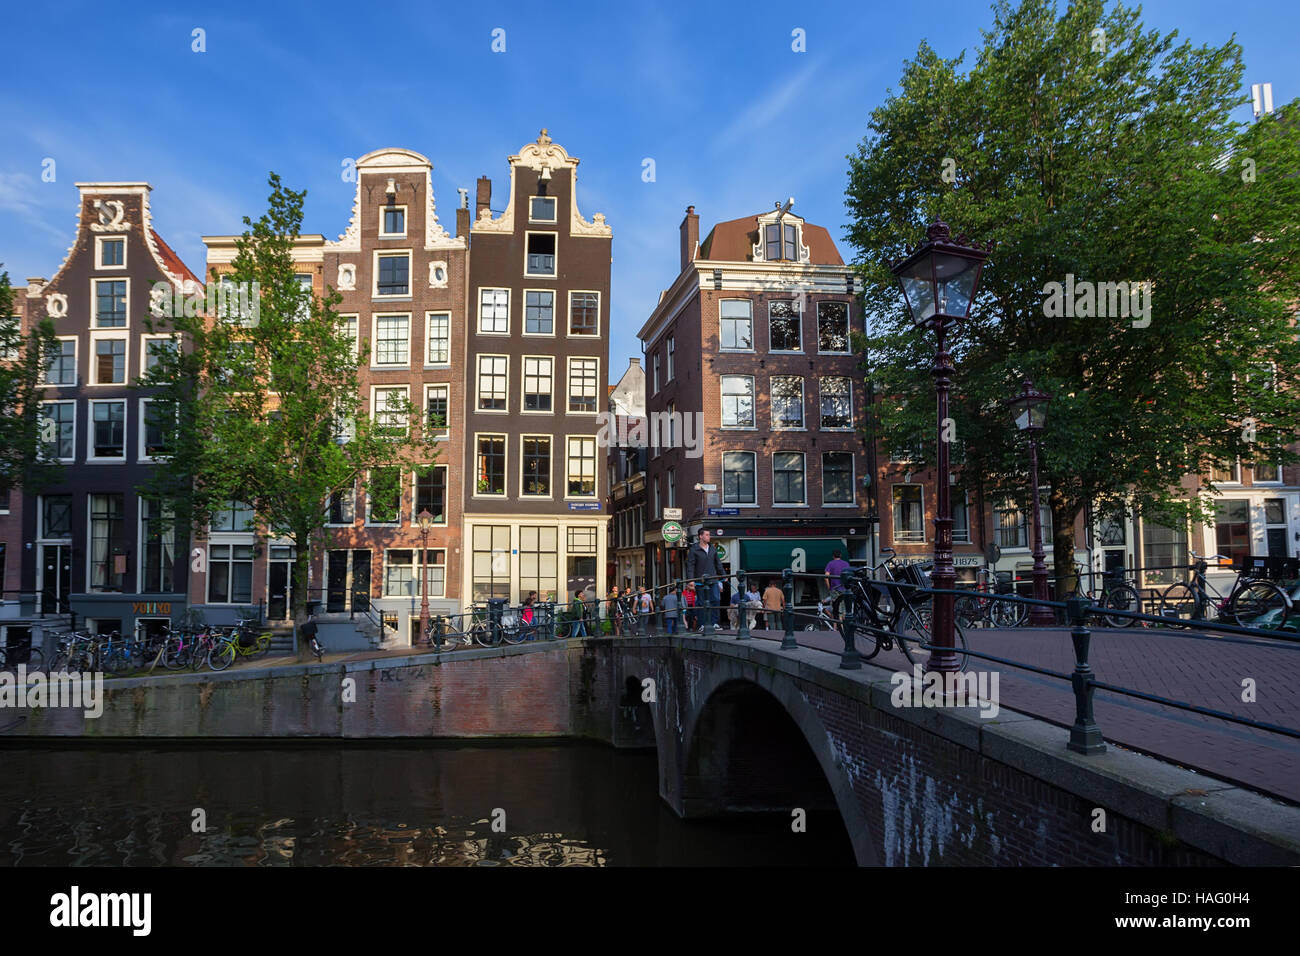 AMSTERDAM - CIRCA JUNIO DE 2014 Imagen De Stock